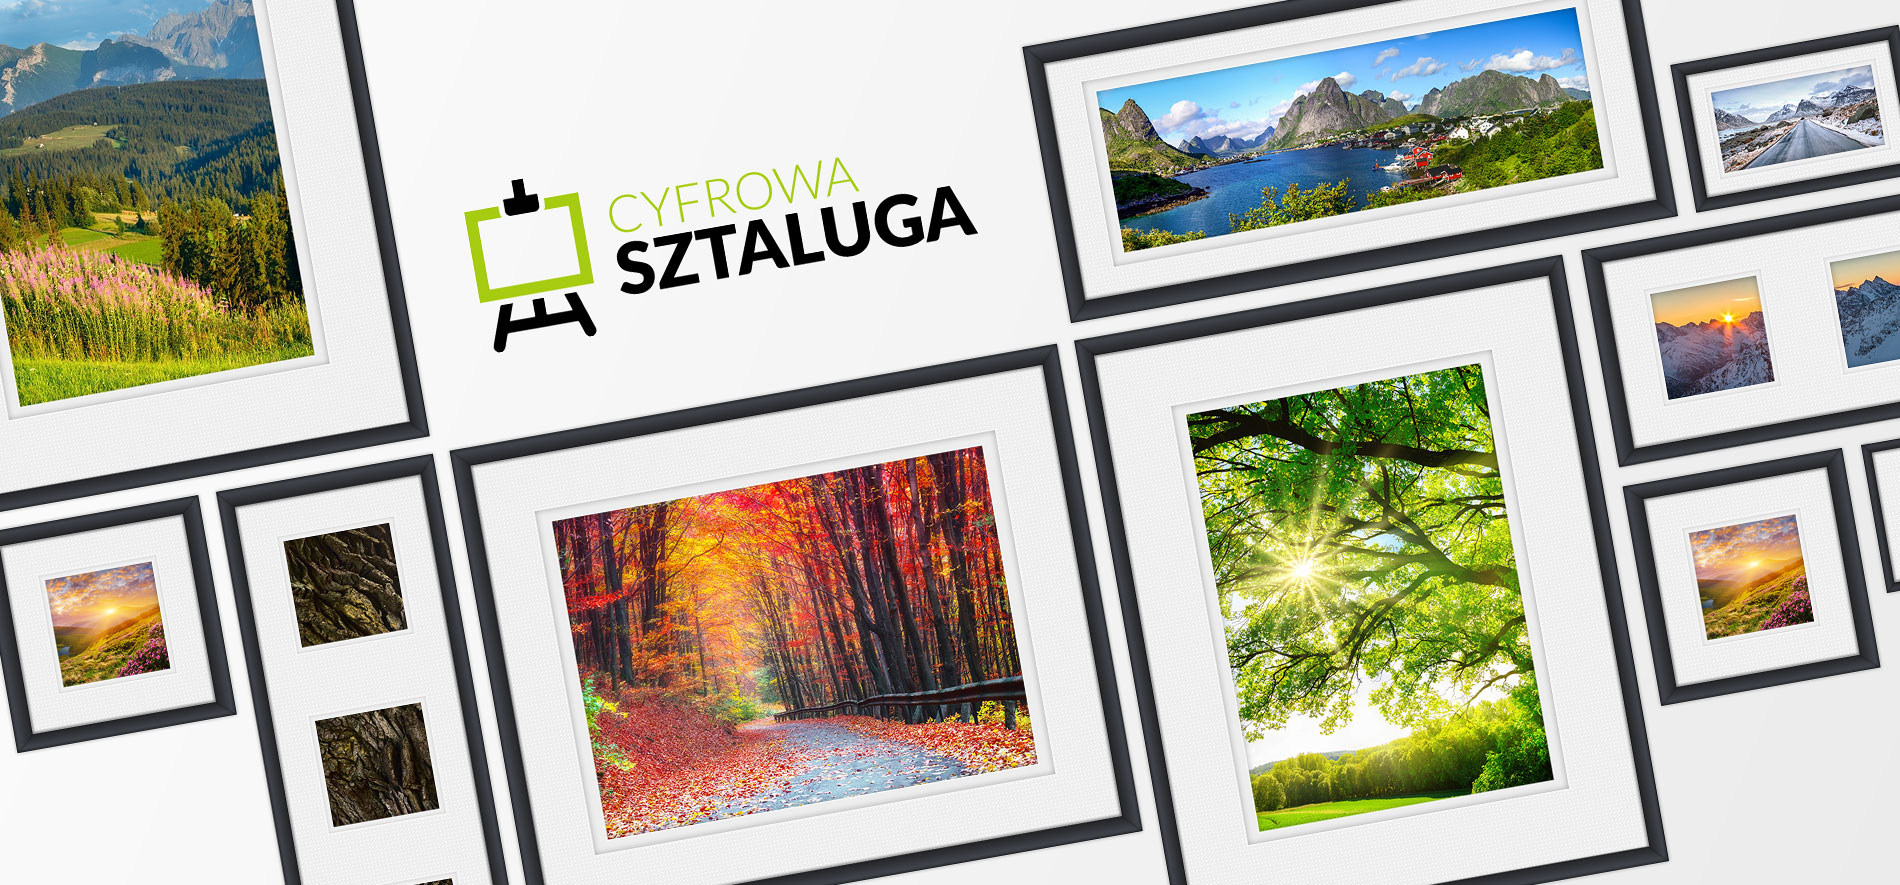 Cyfrowa Sztaluga / <span>Obrazy na płótnie</span>